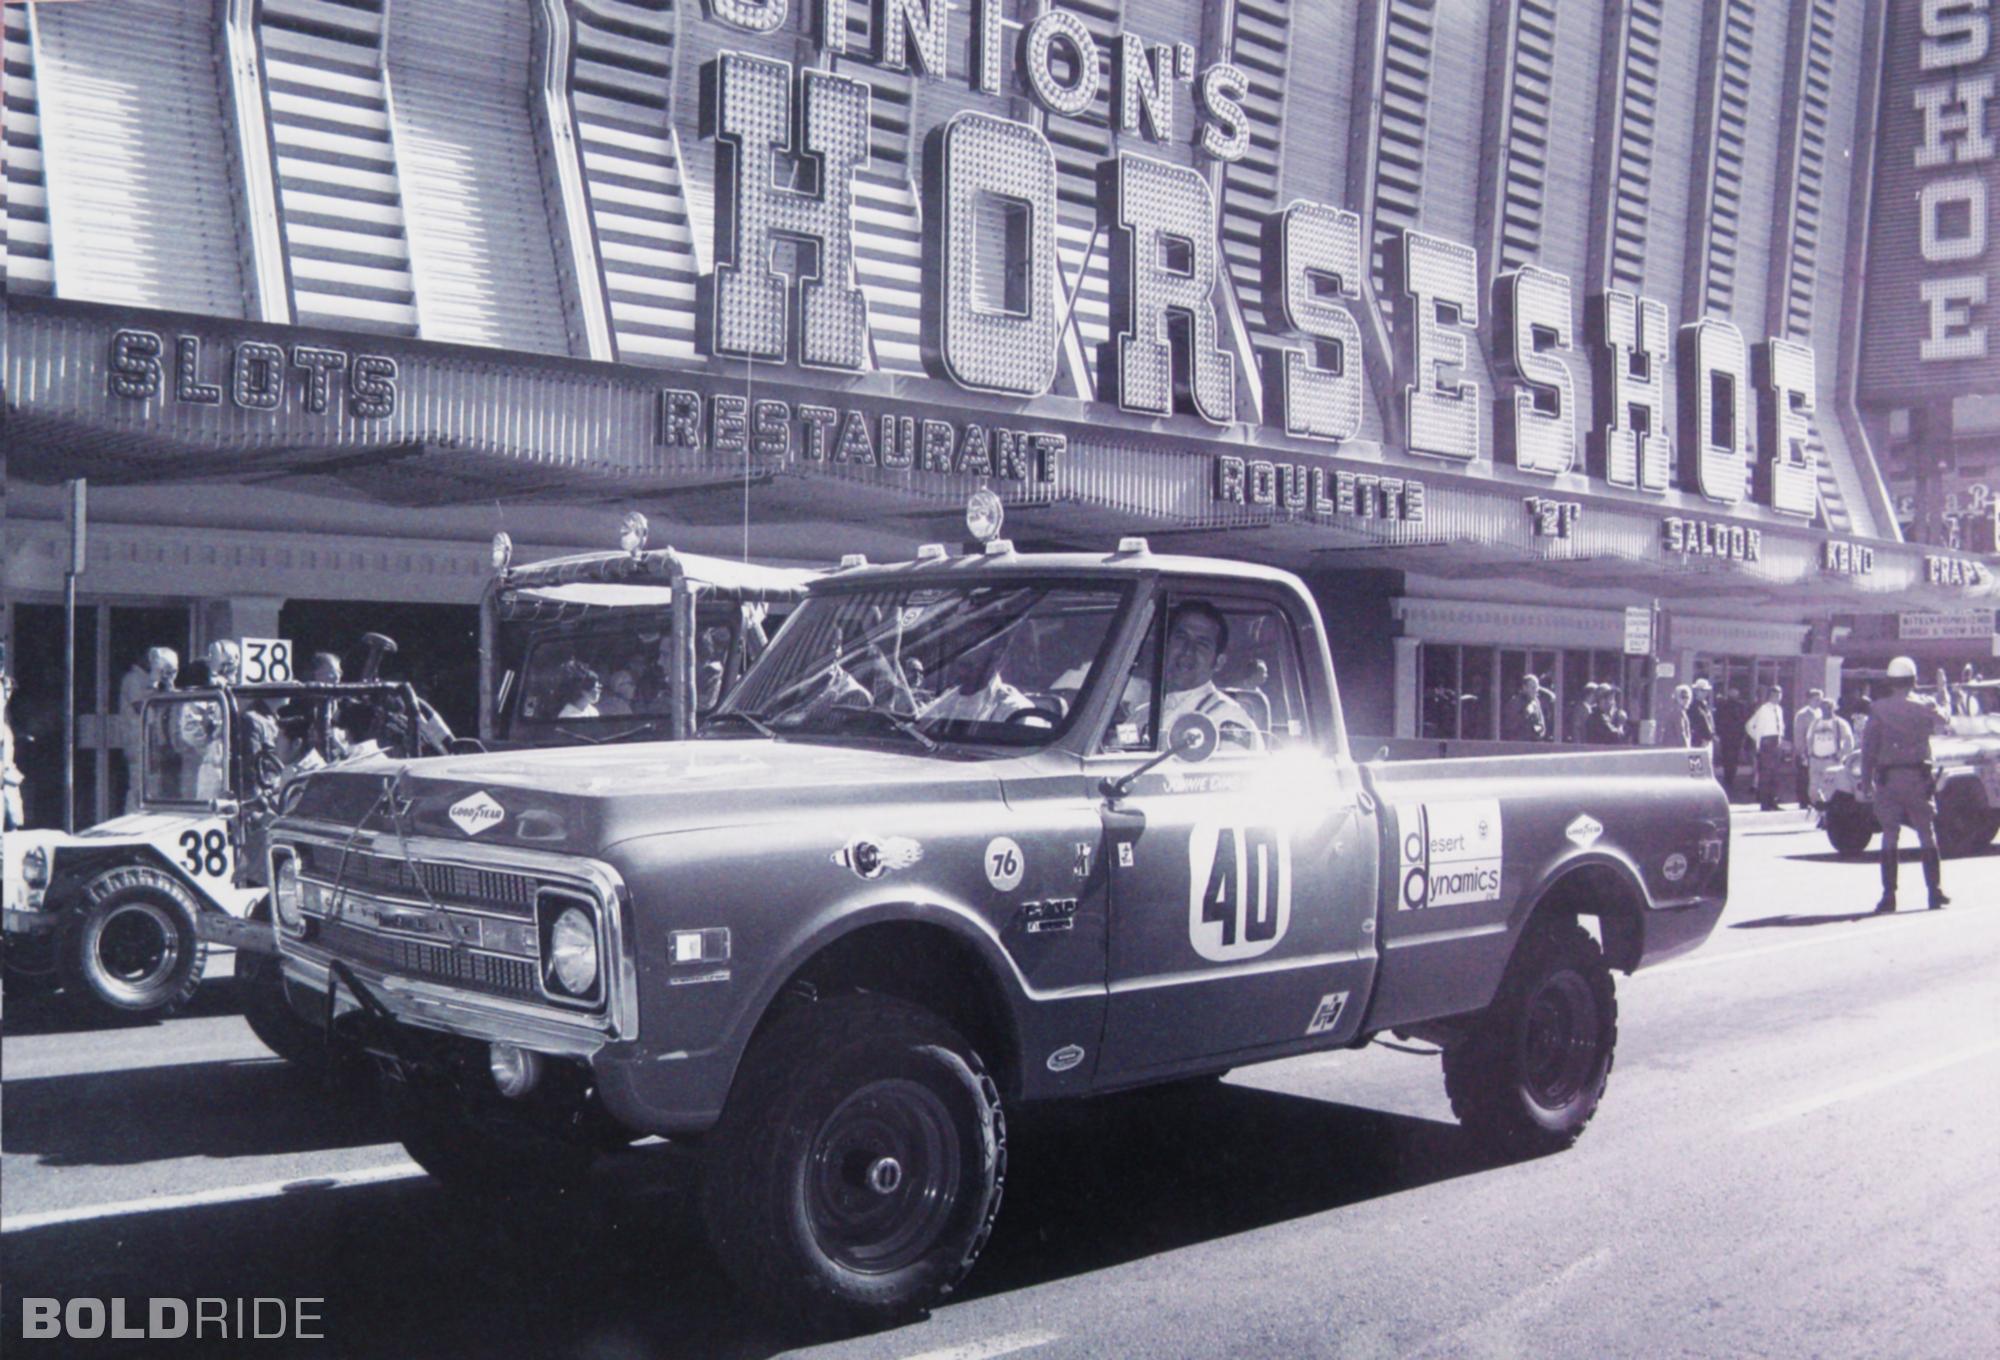 ... Steve McQueen Baja truck classic race racing 4x4 offroad z wallpaper